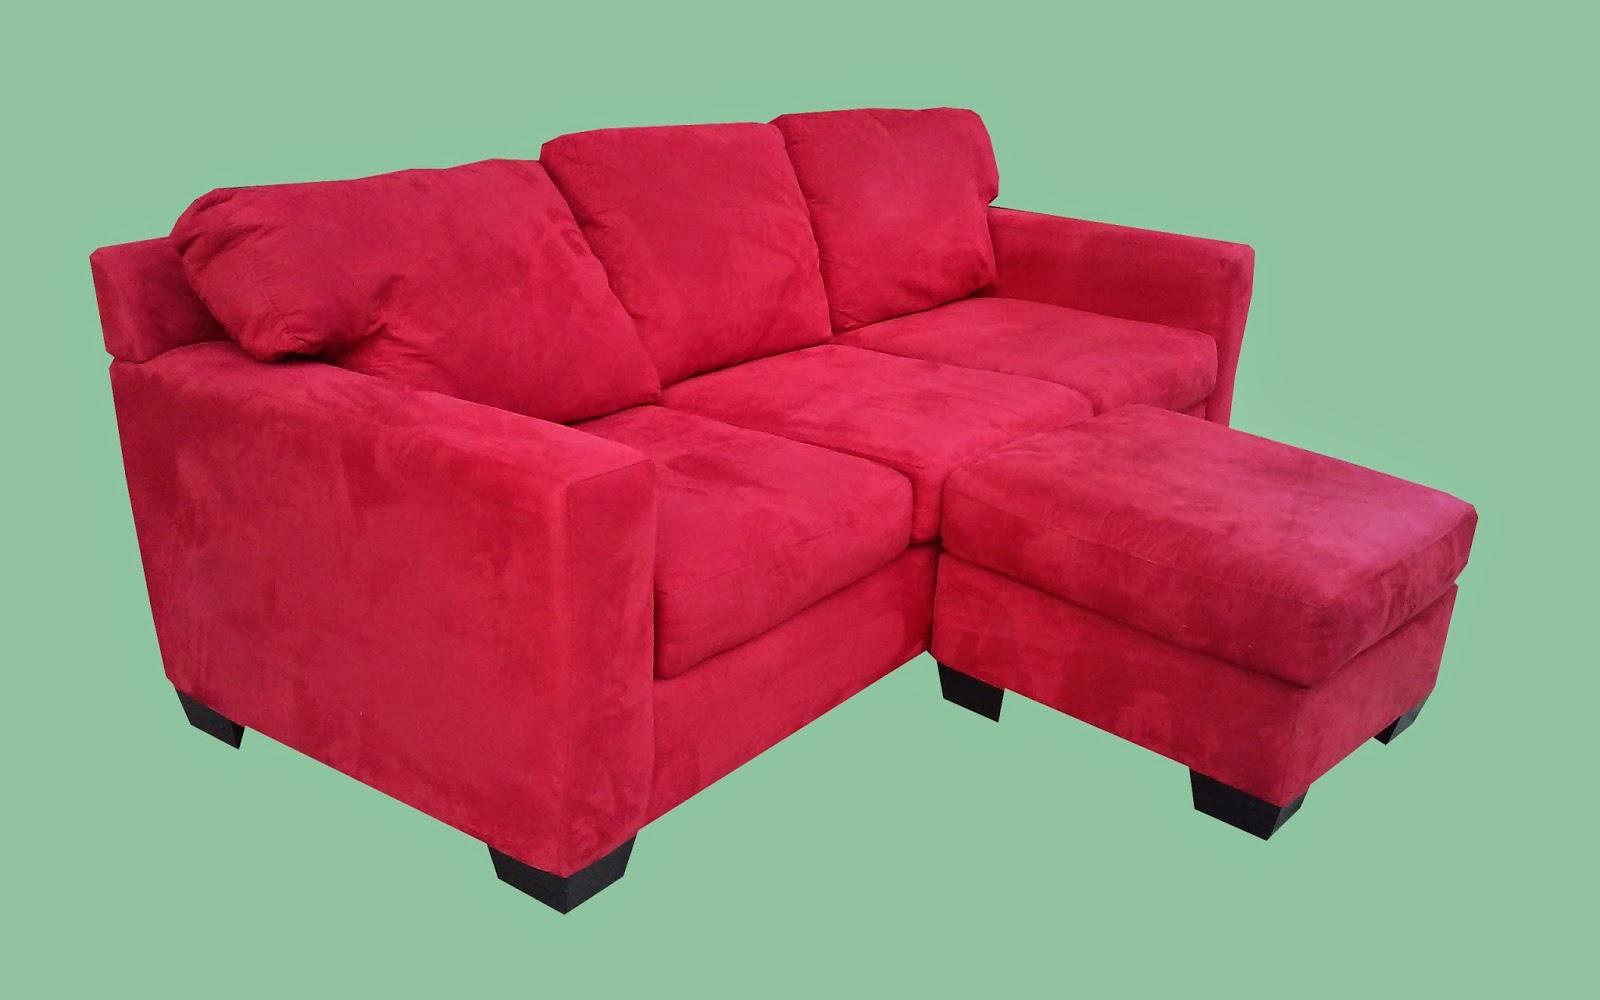 Red Microfiber Sofa Half Round Patio Uhuru Furniture And Collectibles Plush